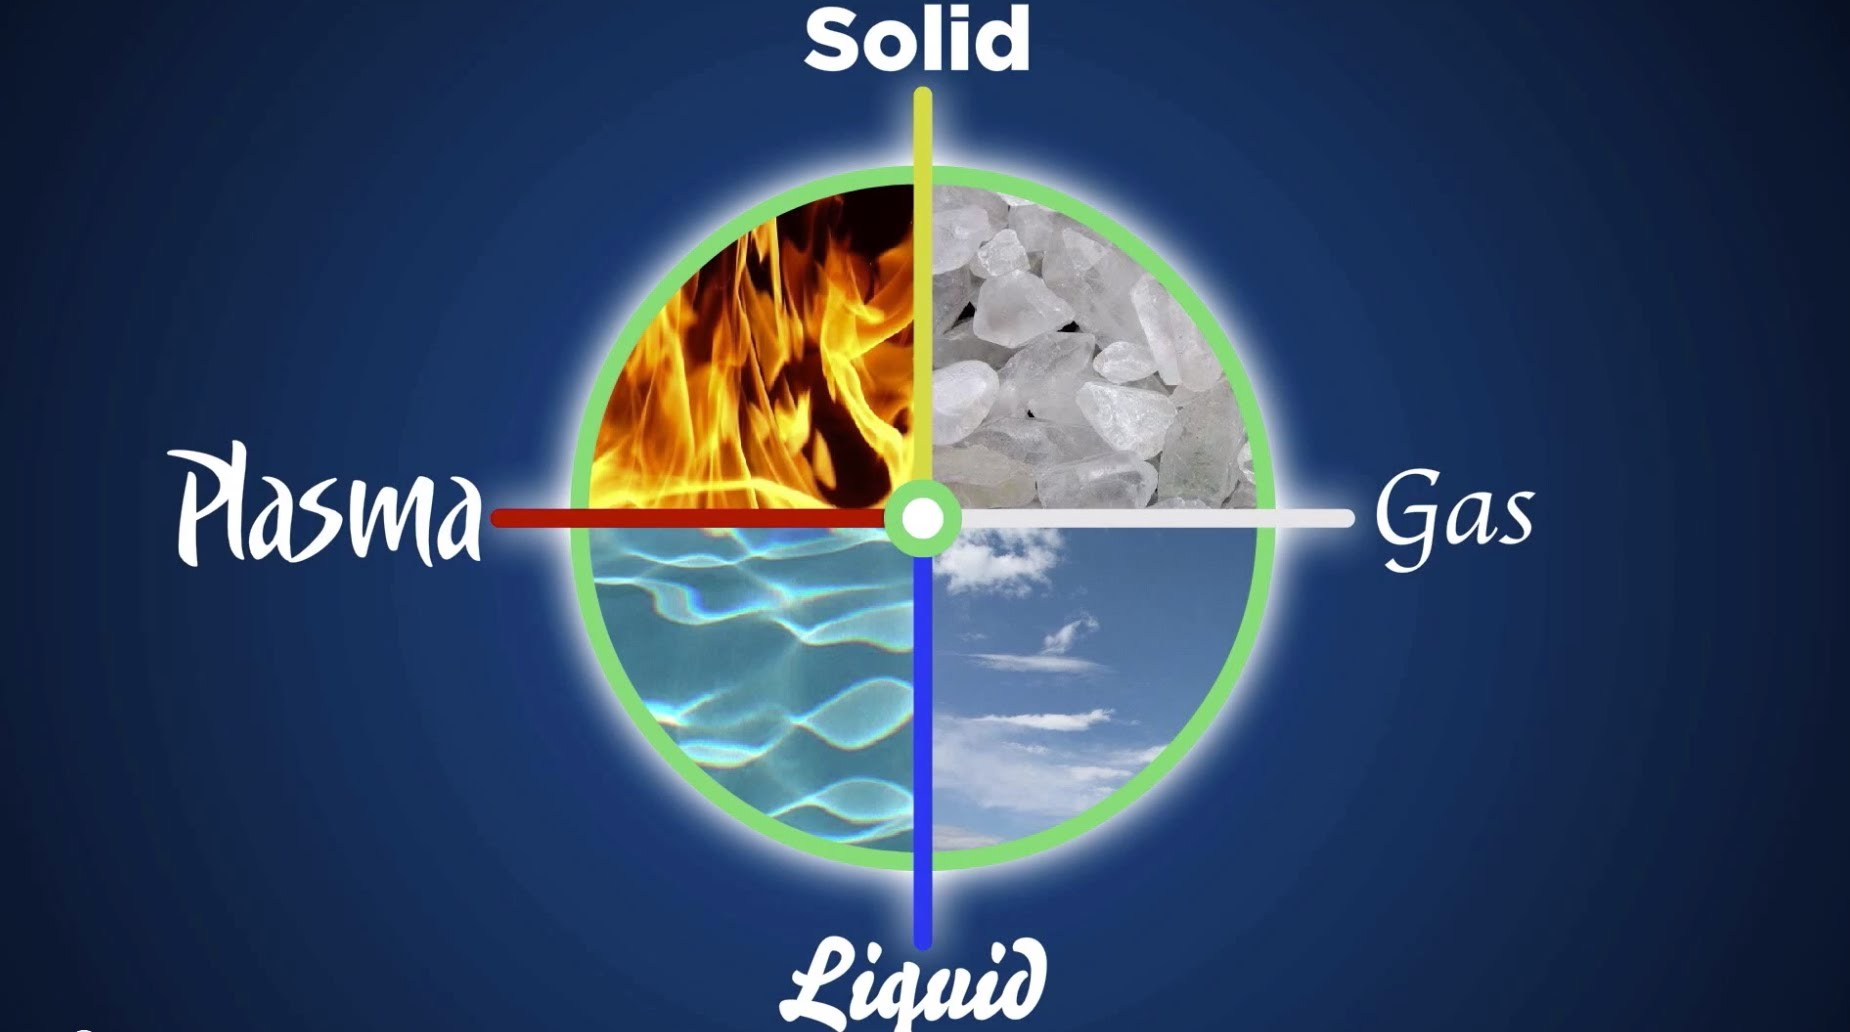 Plasma, solid, gas, liquid (fire, earth, air, water)